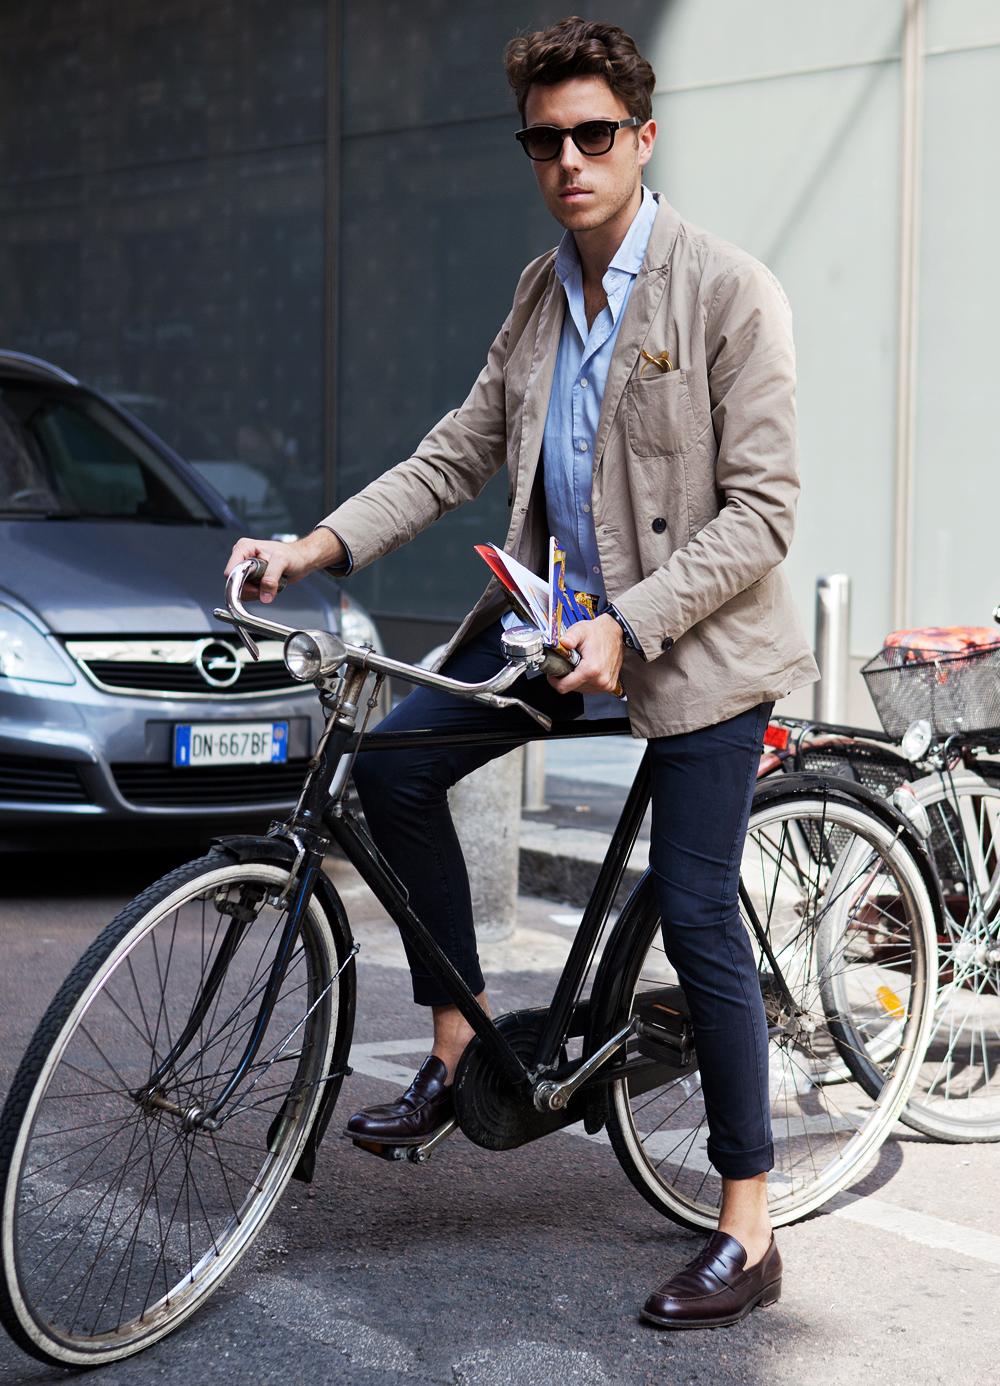 bike-style-bicicleta-estilosa-homem-vaidoso-10.jpg